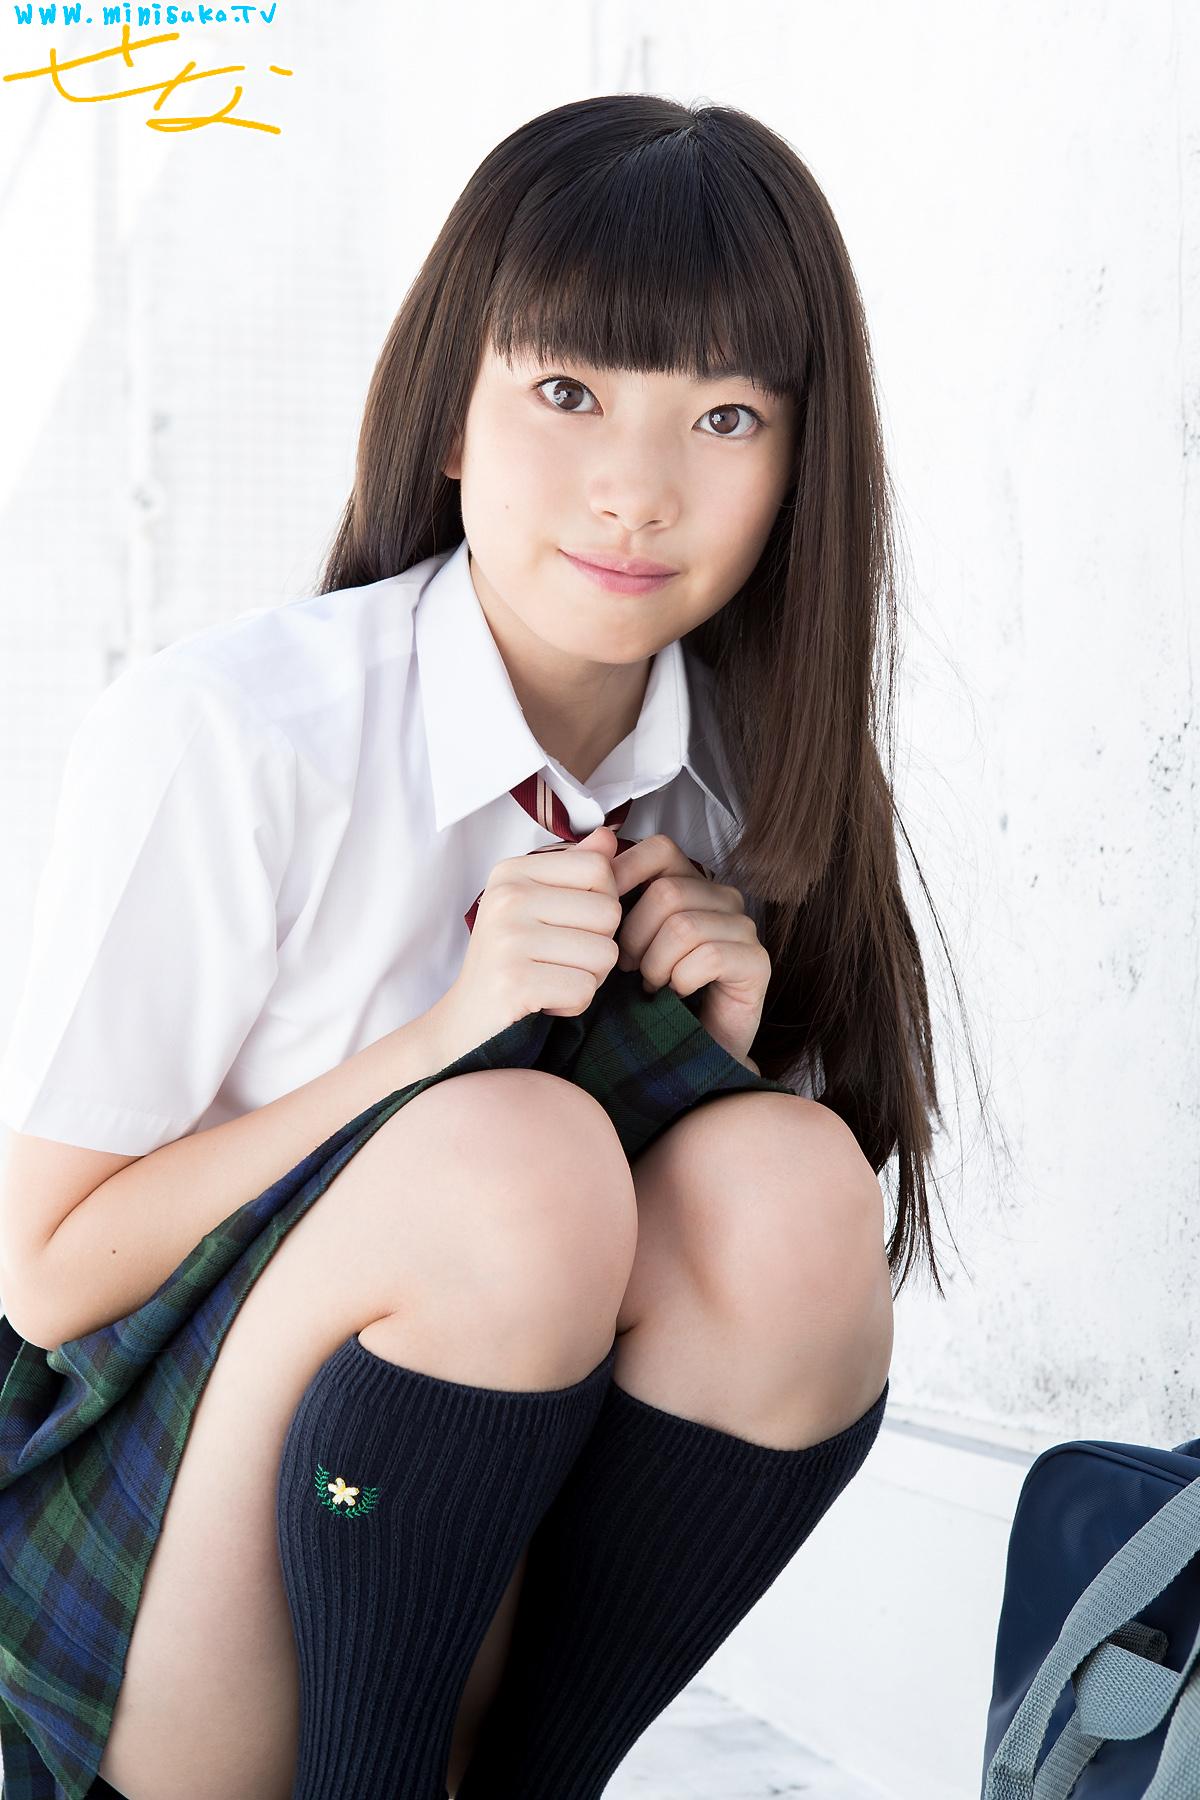 minisuka tv yume Minisuka.tv] 2014-12-18 Yume Shinjo - Regular Gallery 01 ...